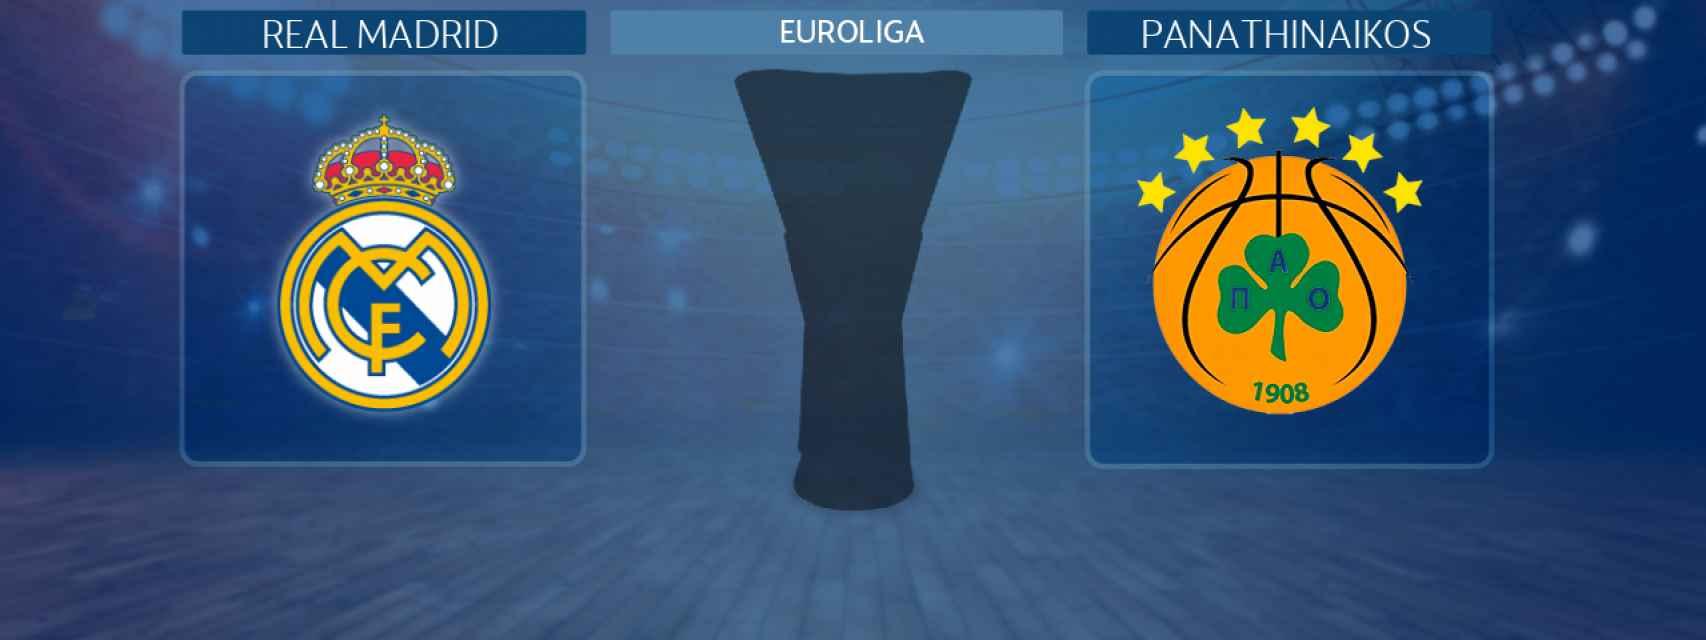 Real Madrid - Panathinaikos, partido de la Euroliga